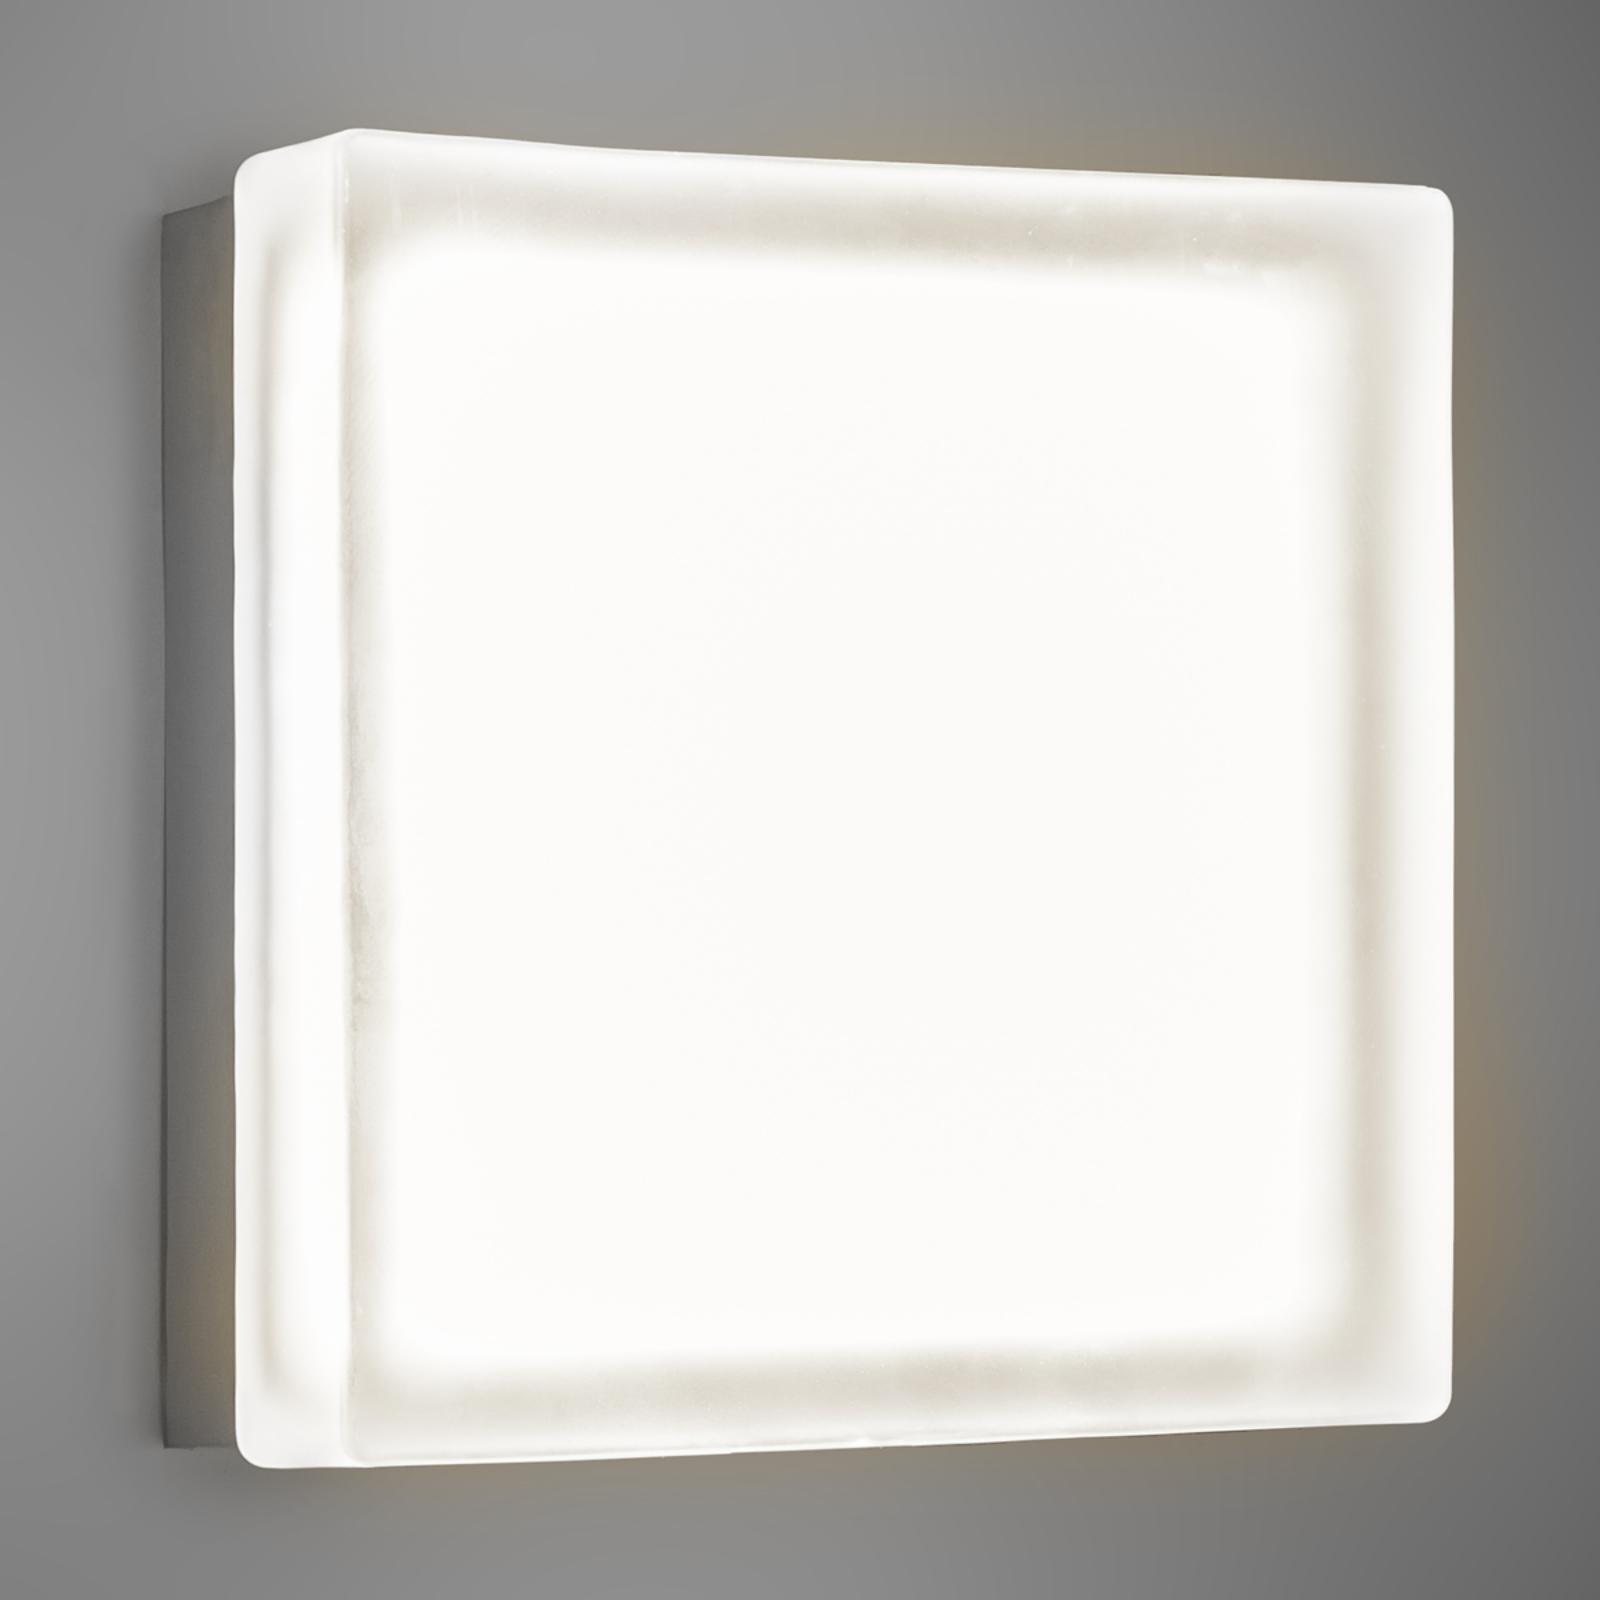 Vierkante led wandlamp Briq 02 warm wit